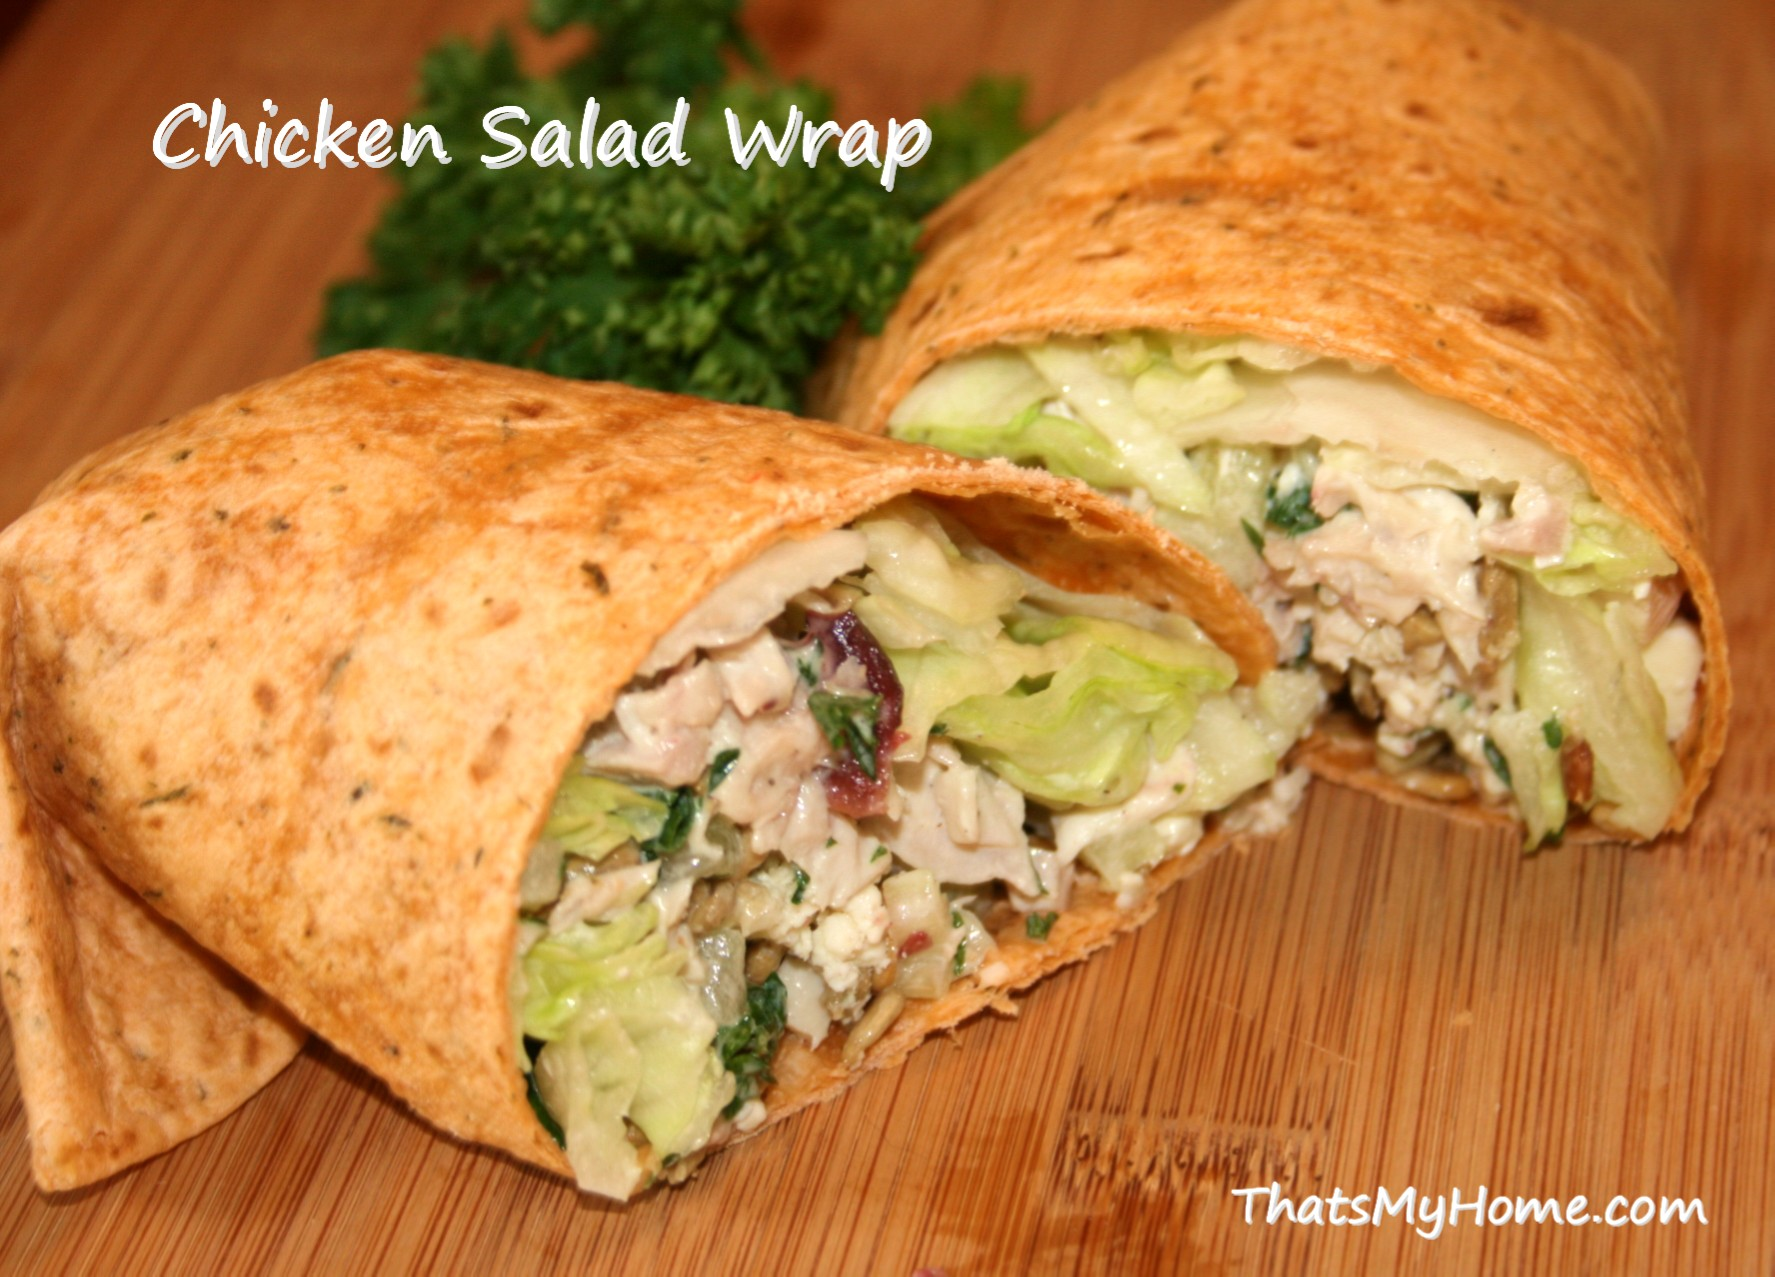 Chicken salad wrap recipe easy homemade chicken salad wraps let